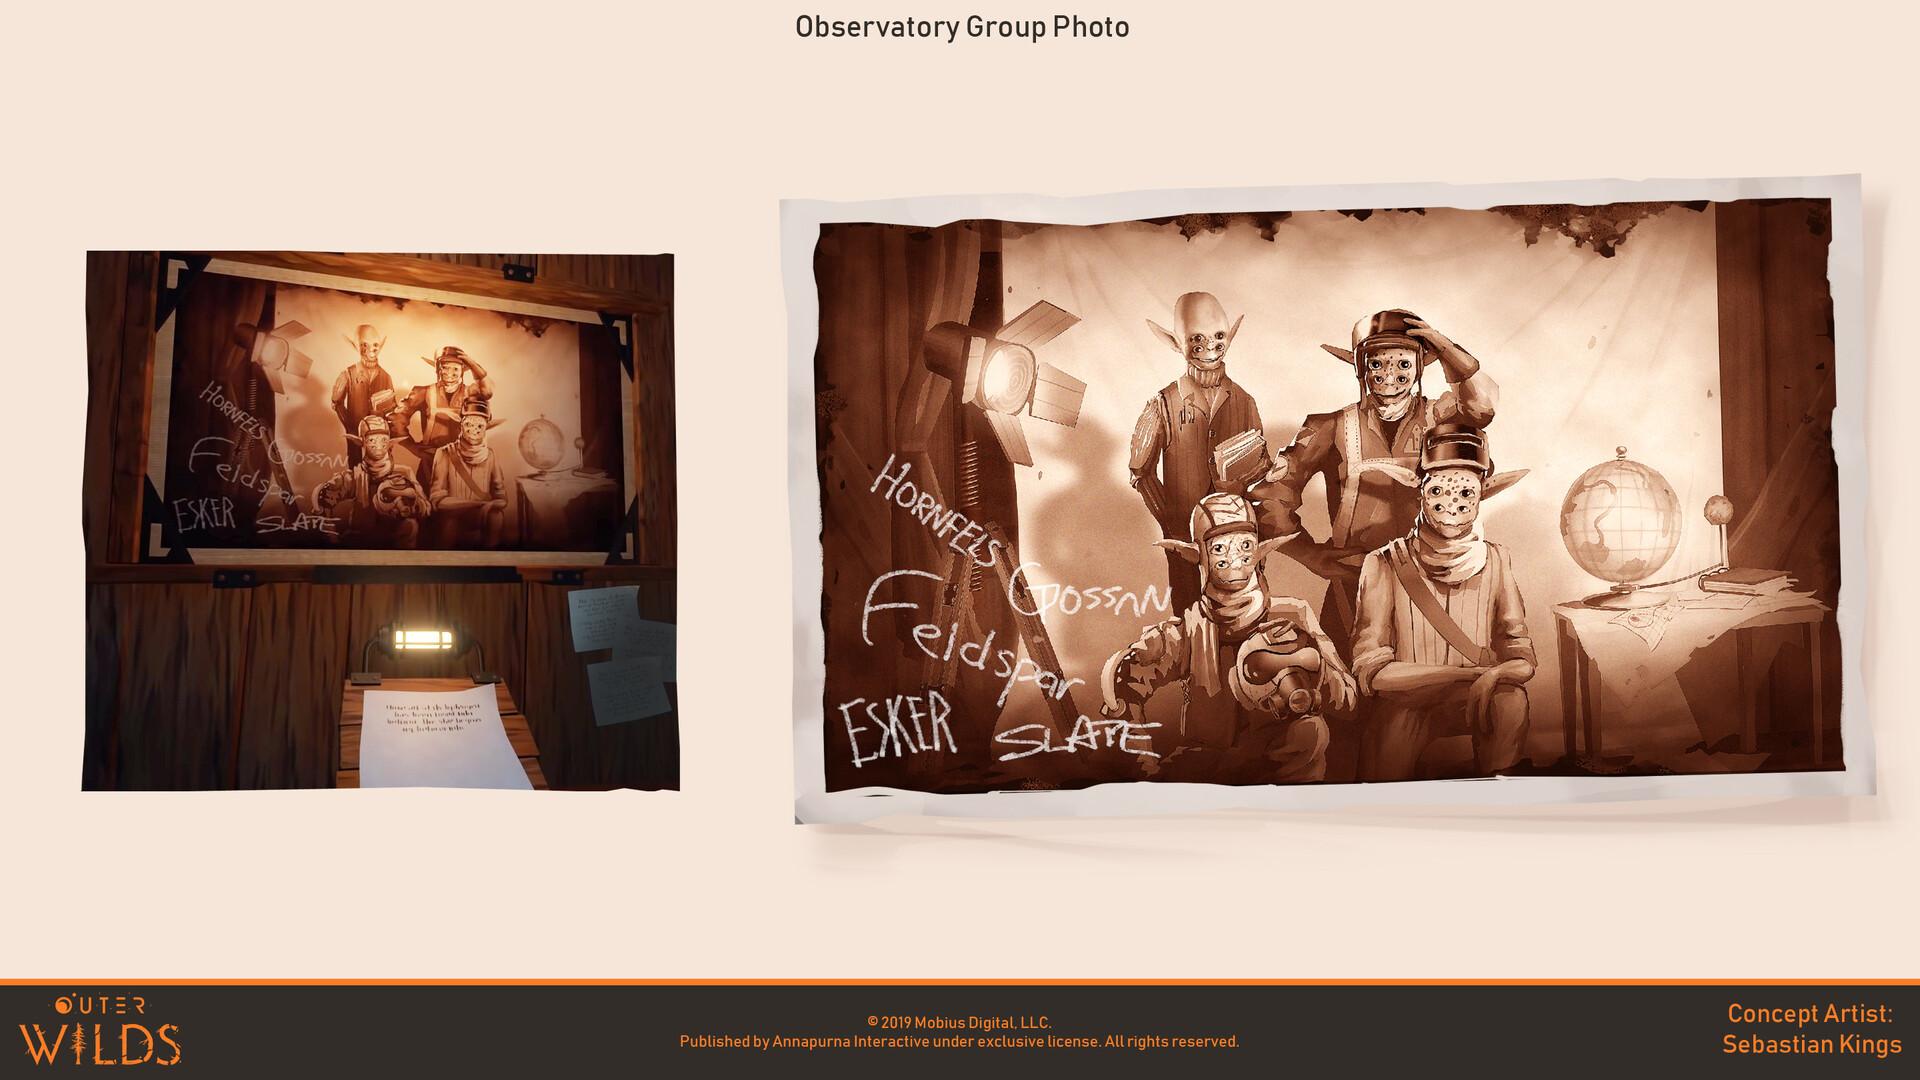 © Sebastian Kings, Concept art, Outer Wilds, Mobius Digital, Annapurna Interactive, 2019.